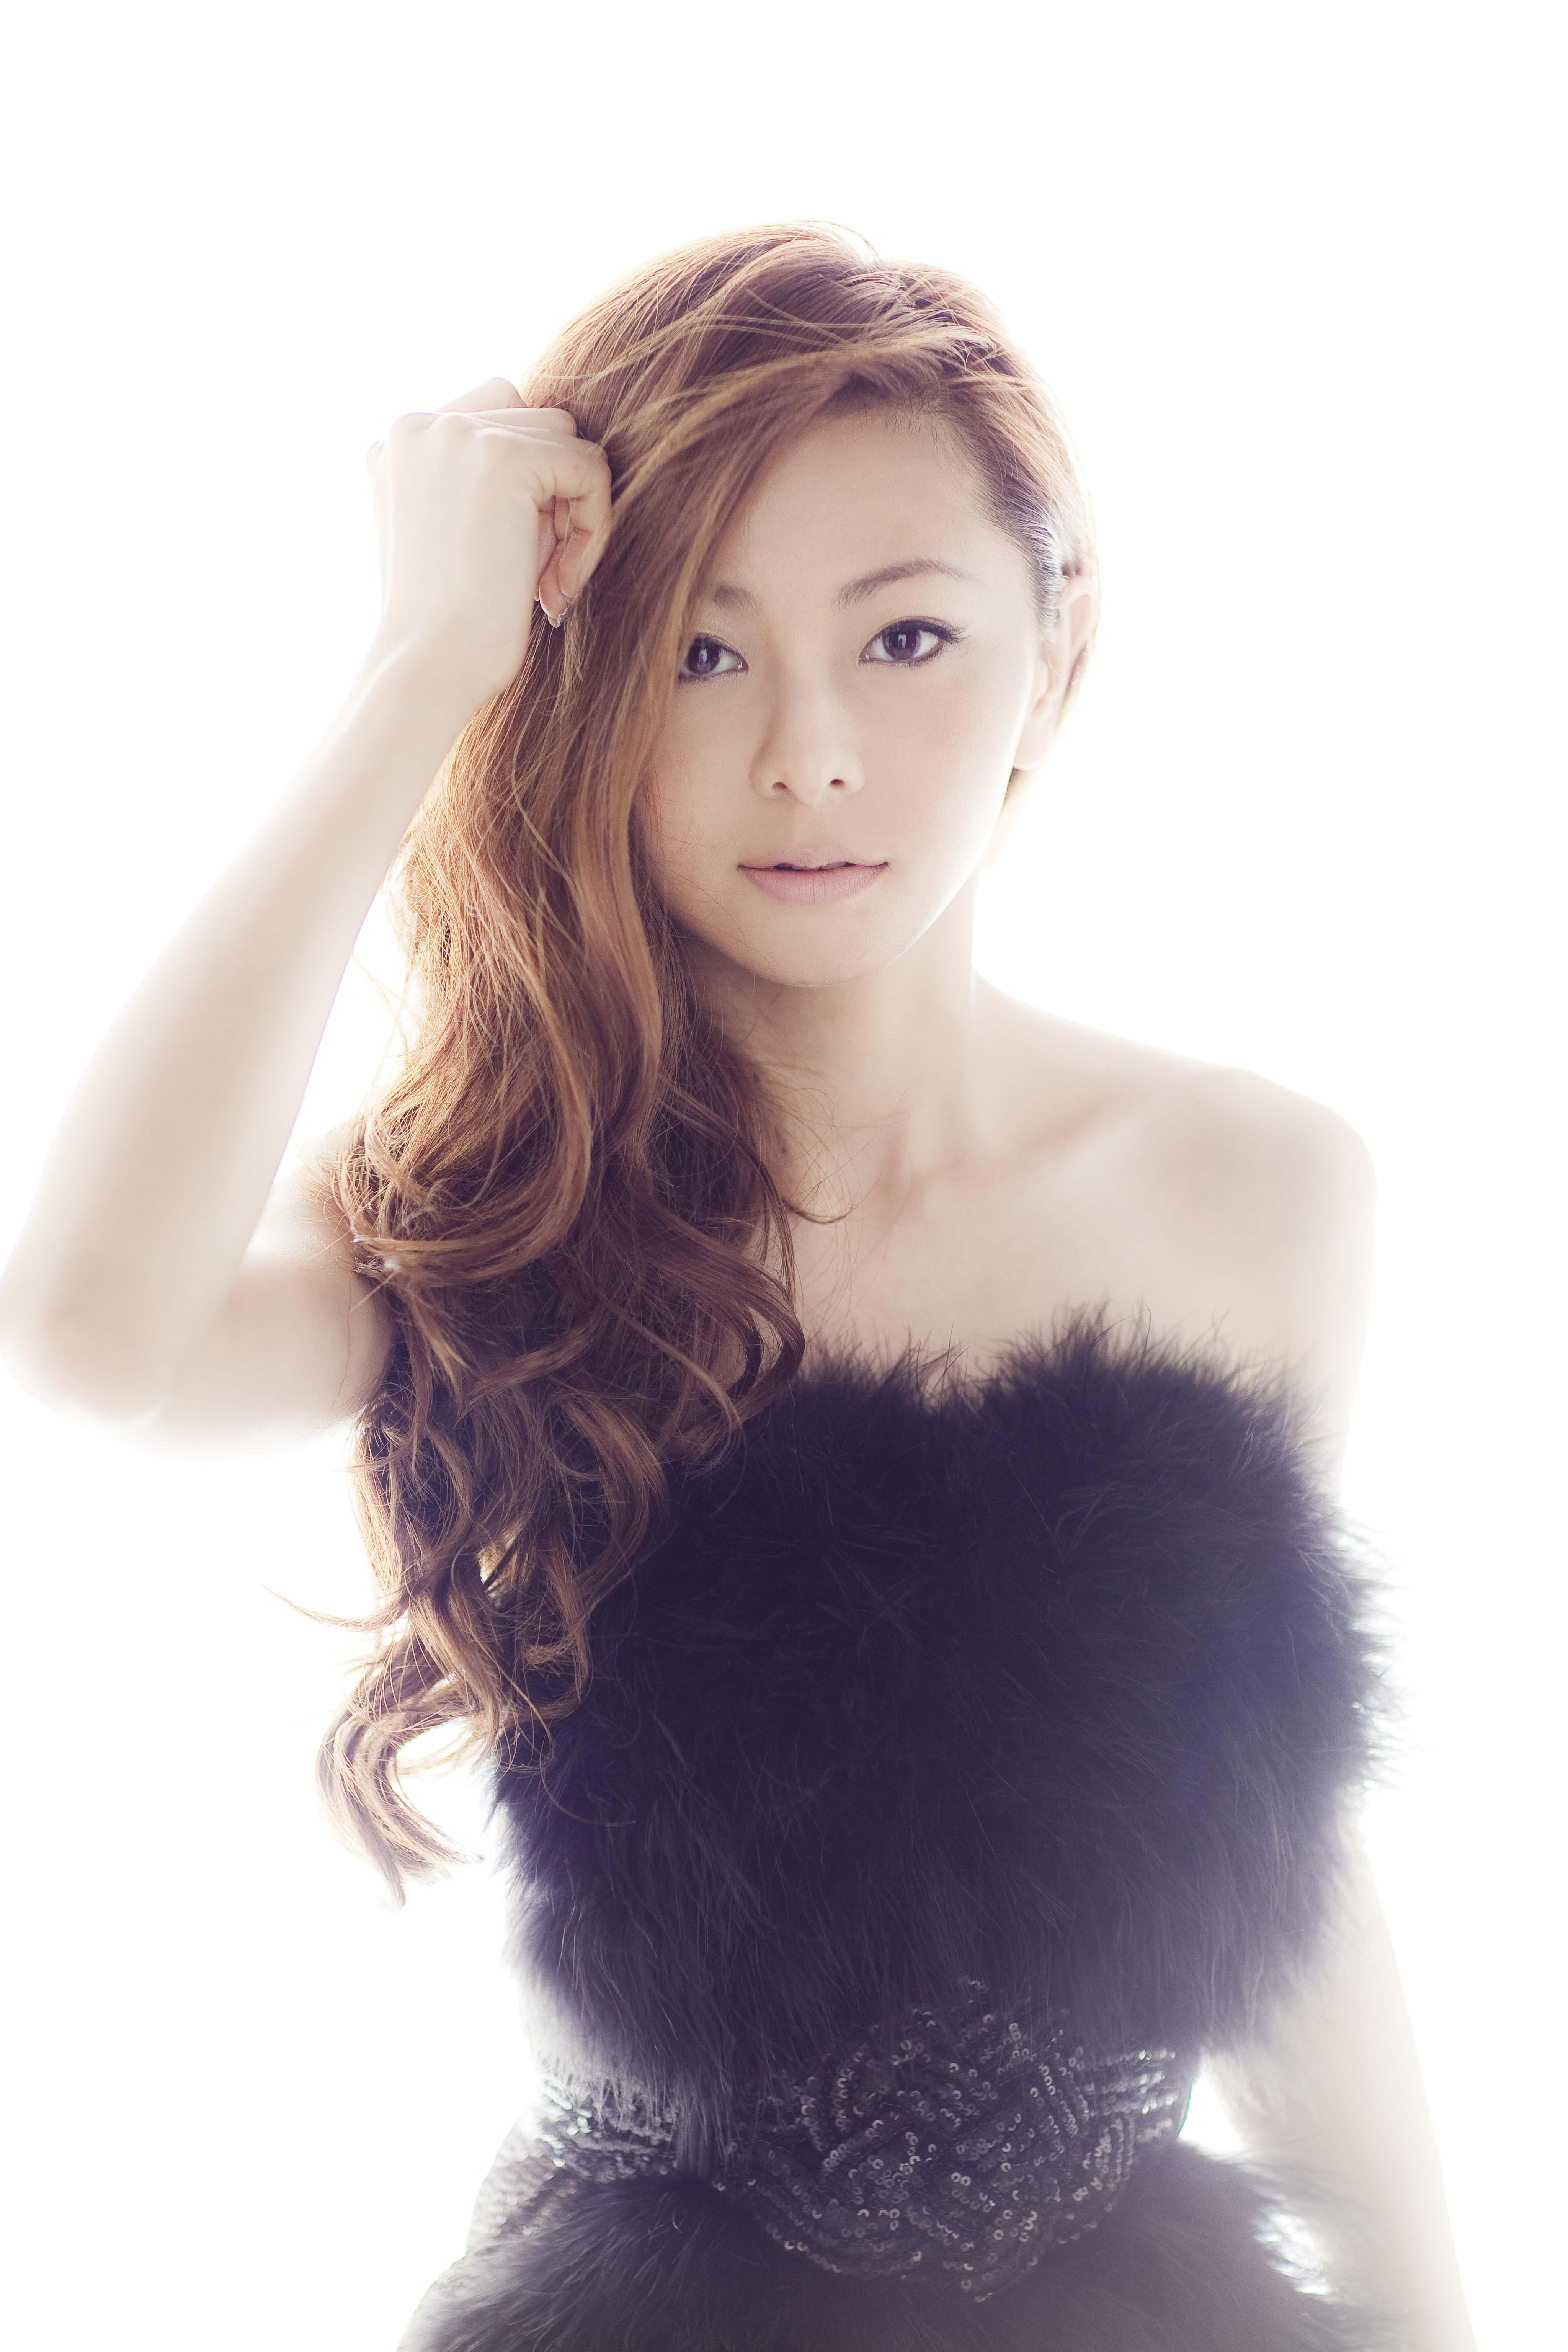 _Kenji5840-retouch-pro.jpg